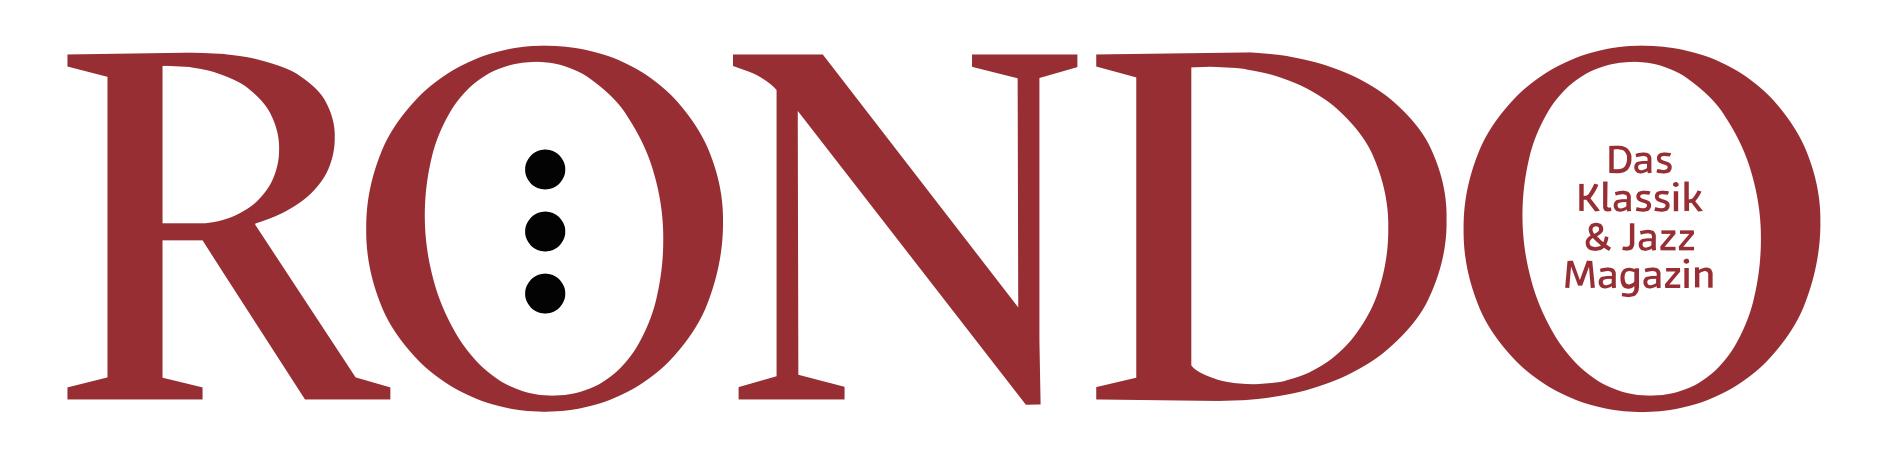 rondo-magazine